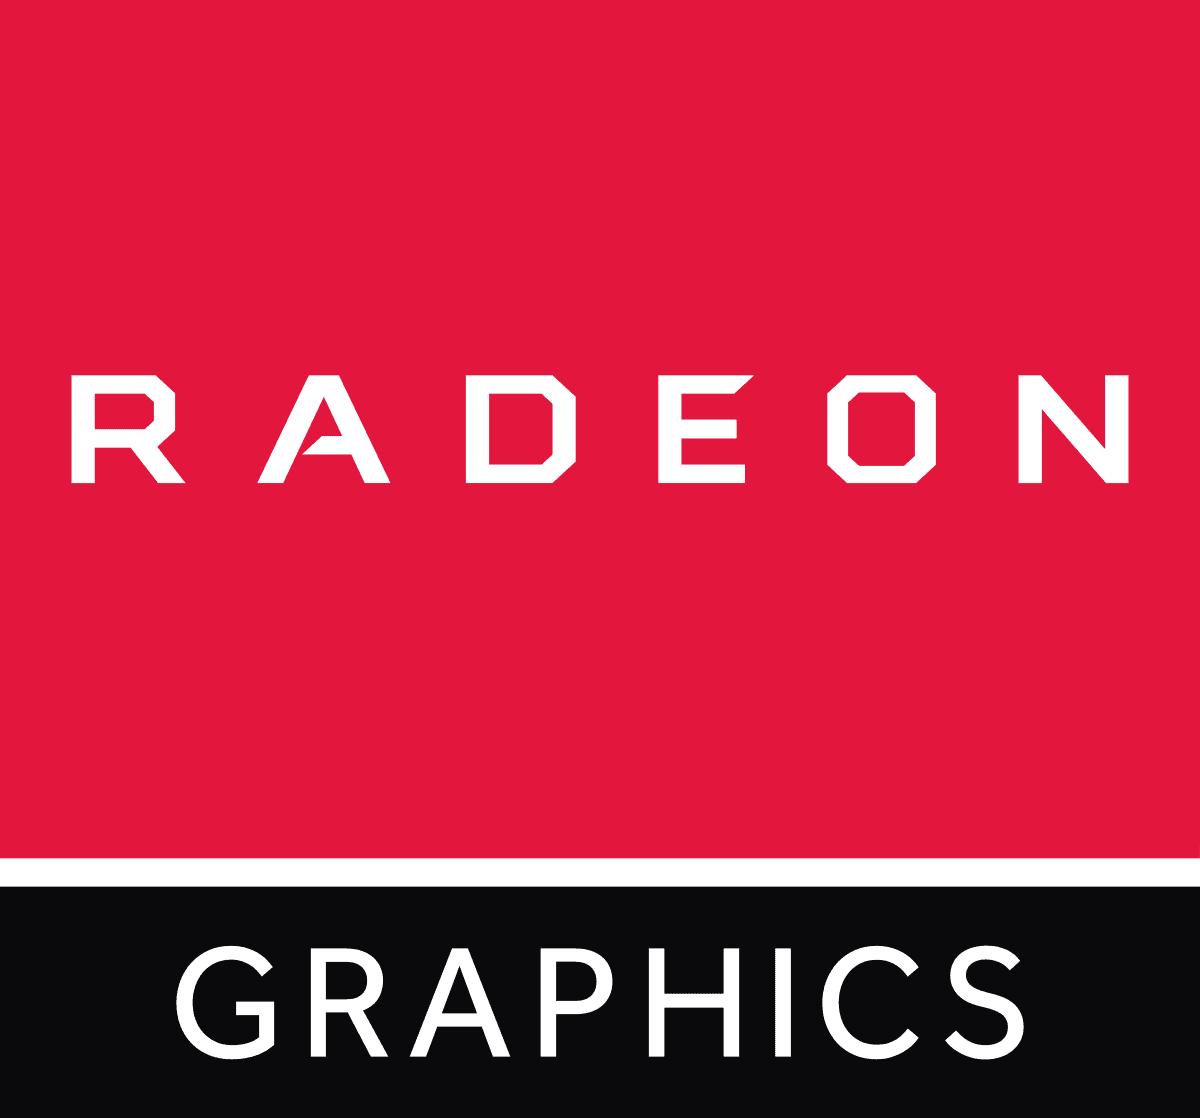 PowerColor Radeon RX 5600 XT Red Dragon Review 2